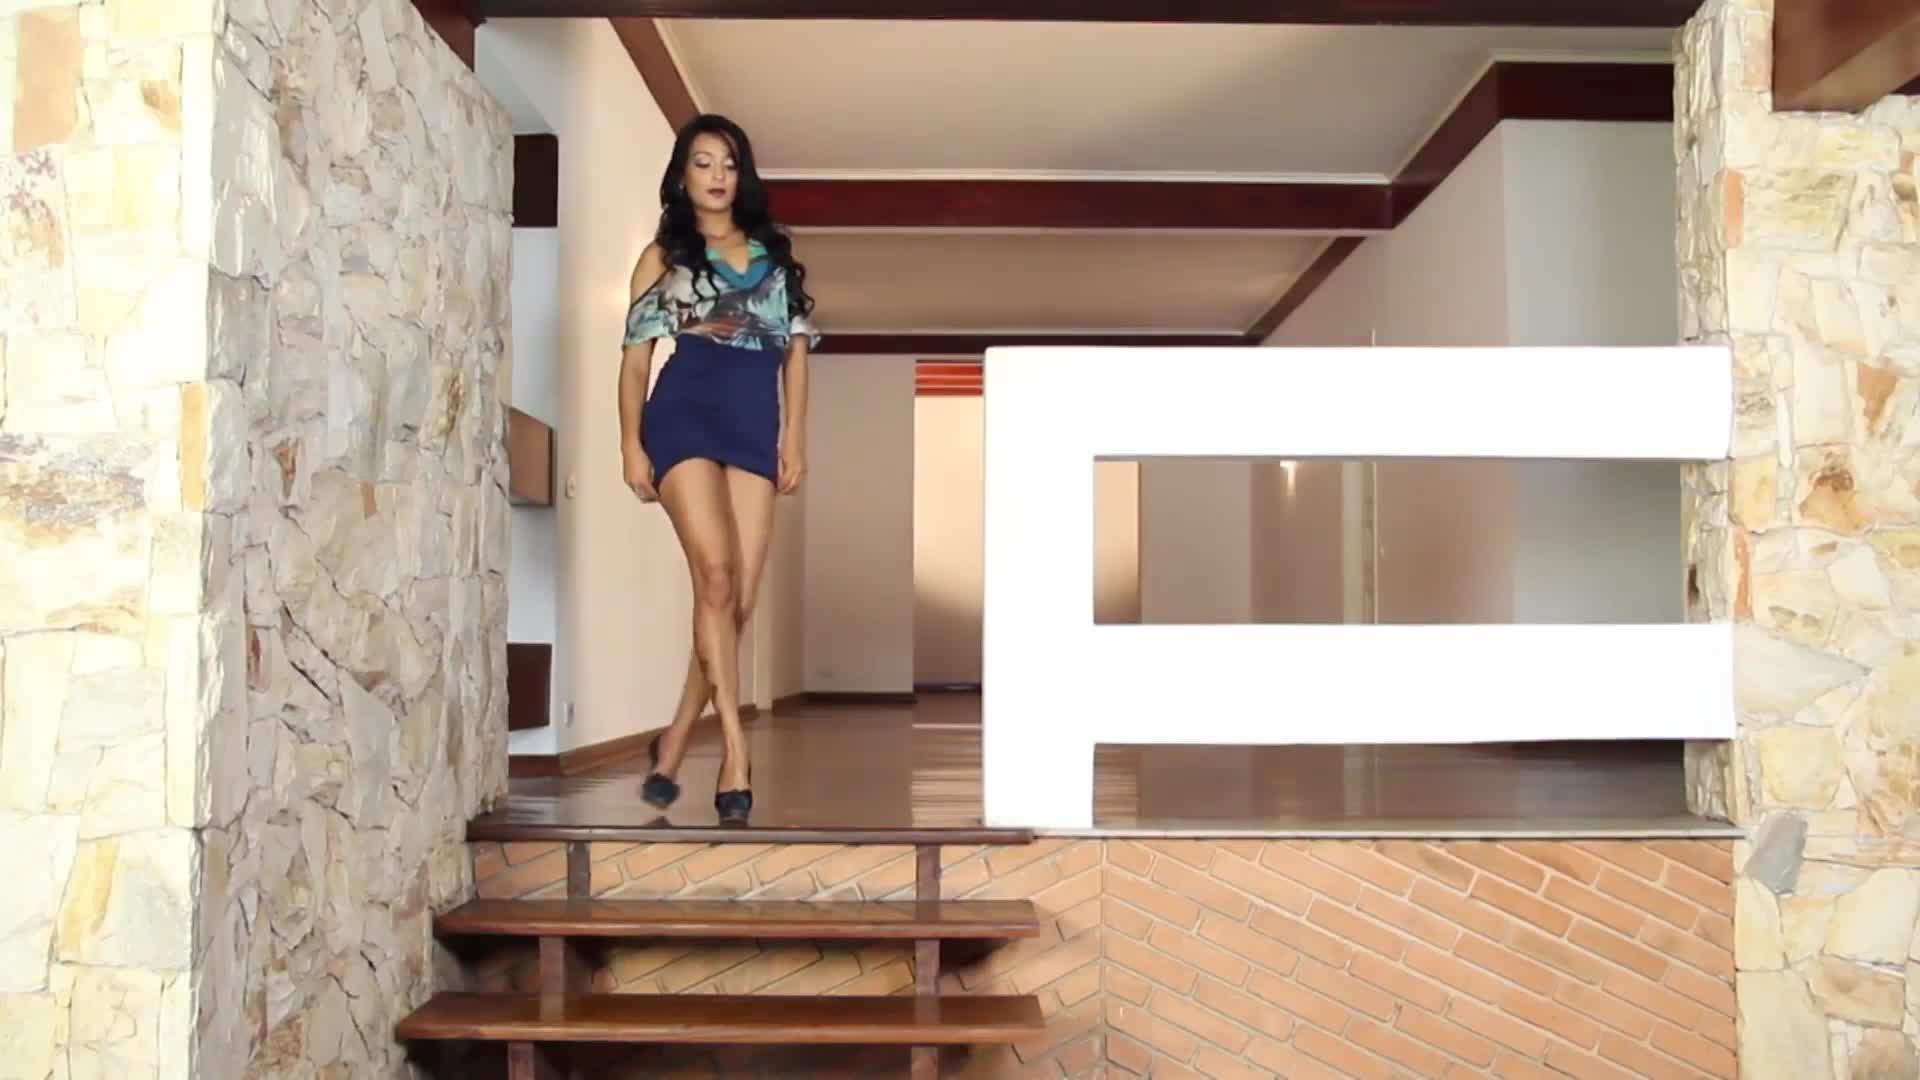 Brazilian Women - Karina Oliveira